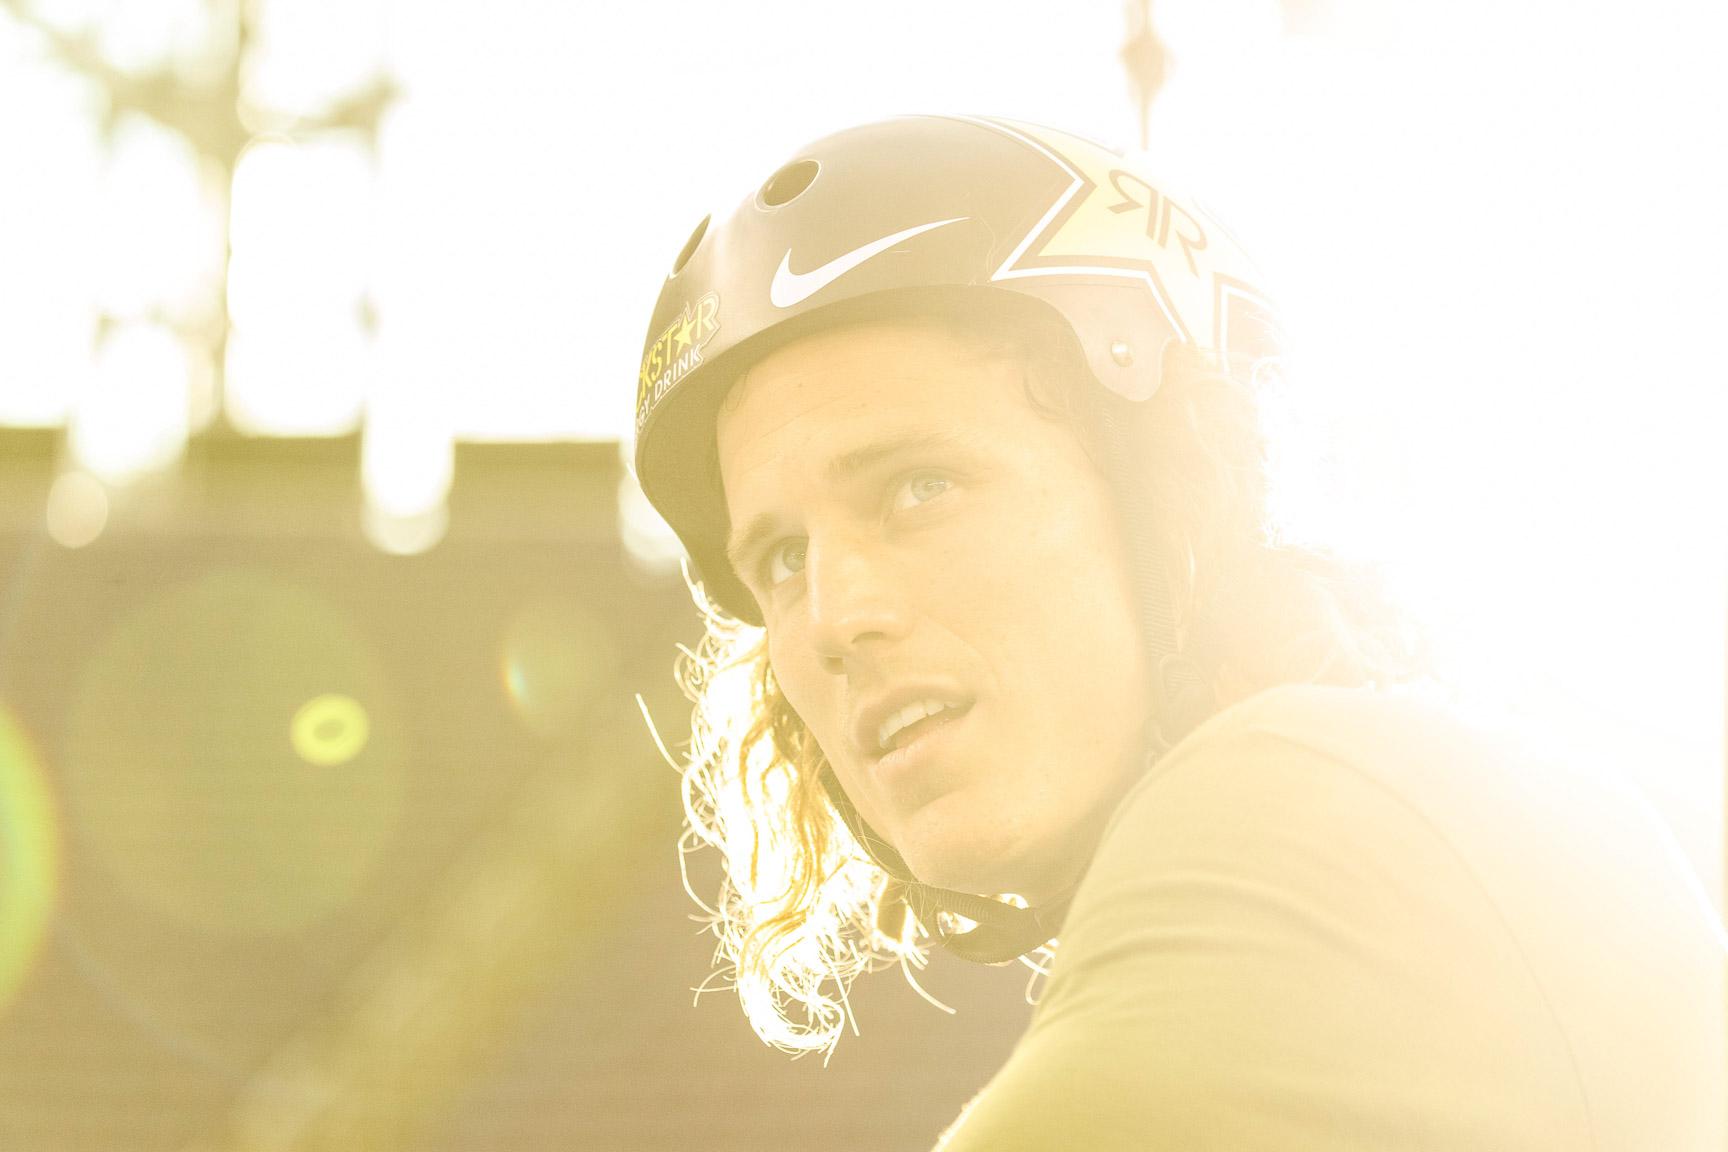 Dennis Enarson, BMX Park practice